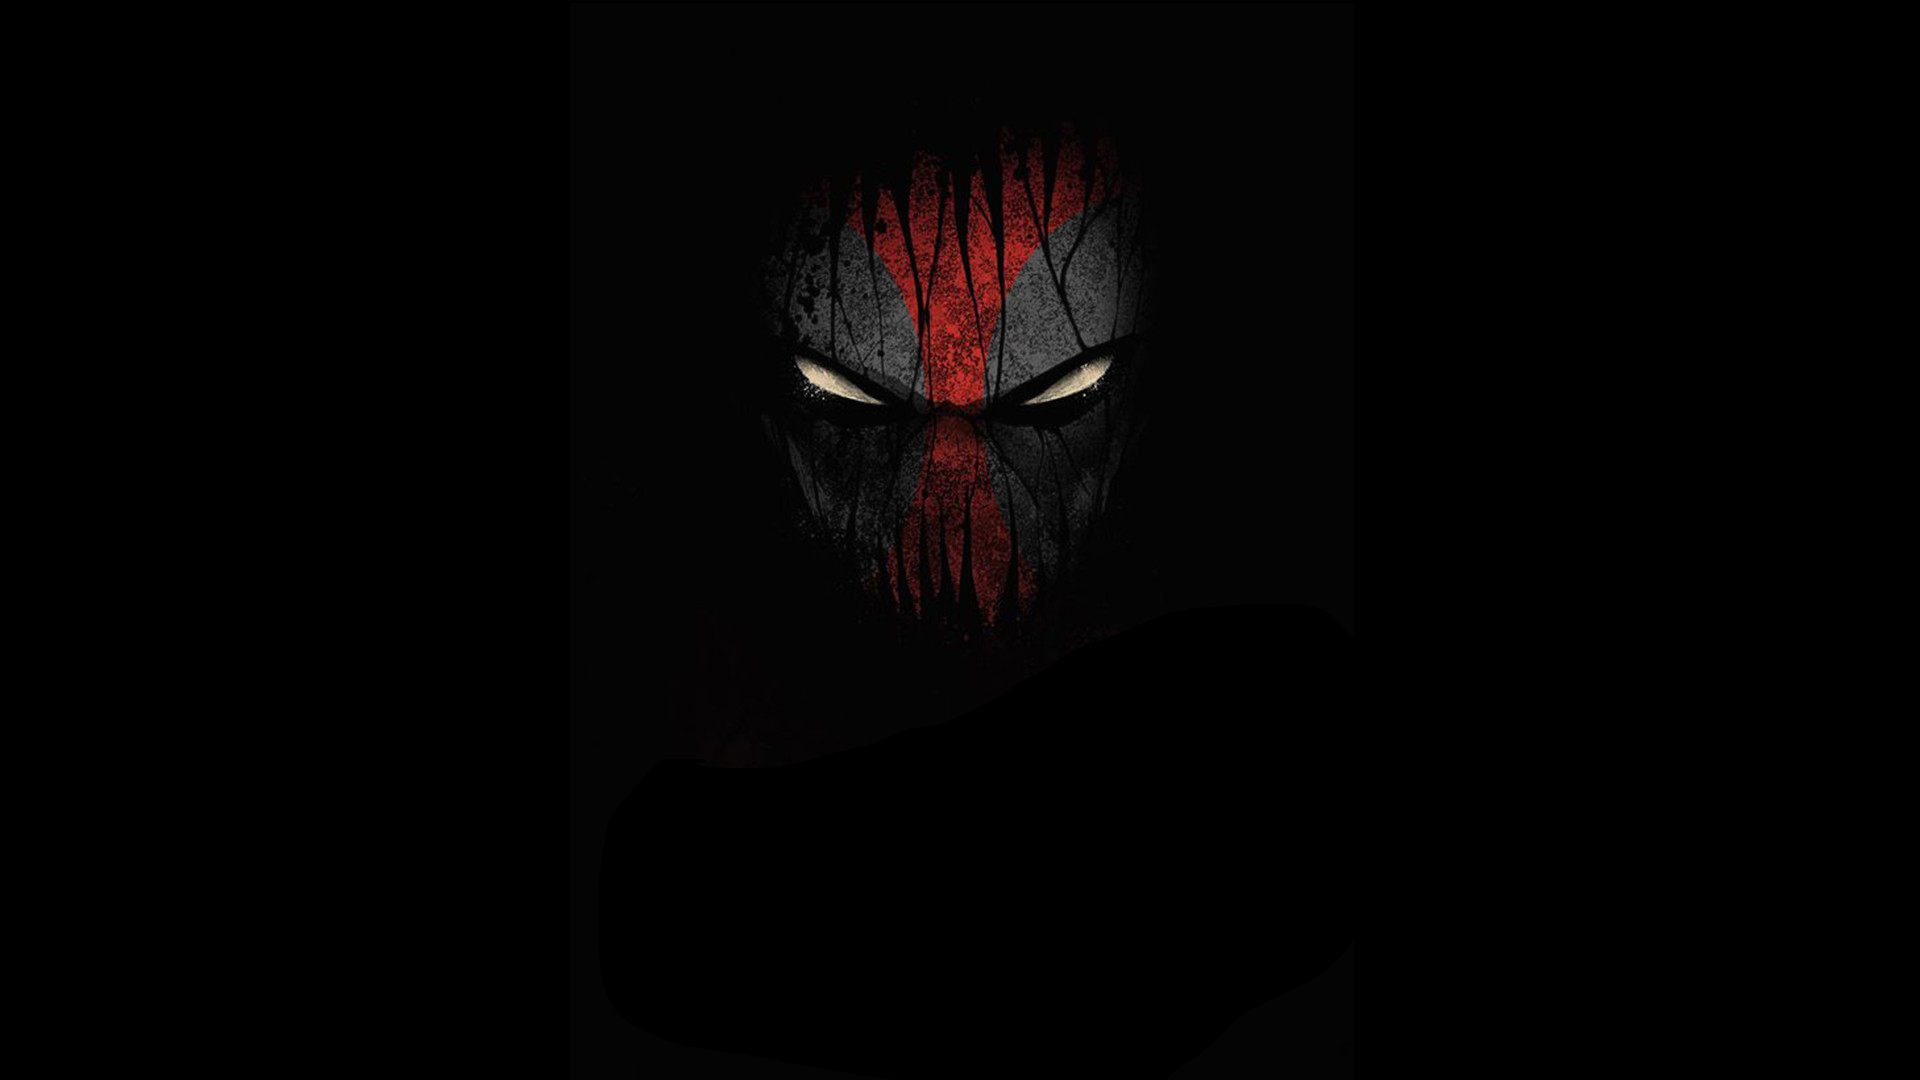 Good Wallpaper Marvel Face - Deadpool-Face-HD  Picture_274156.jpg